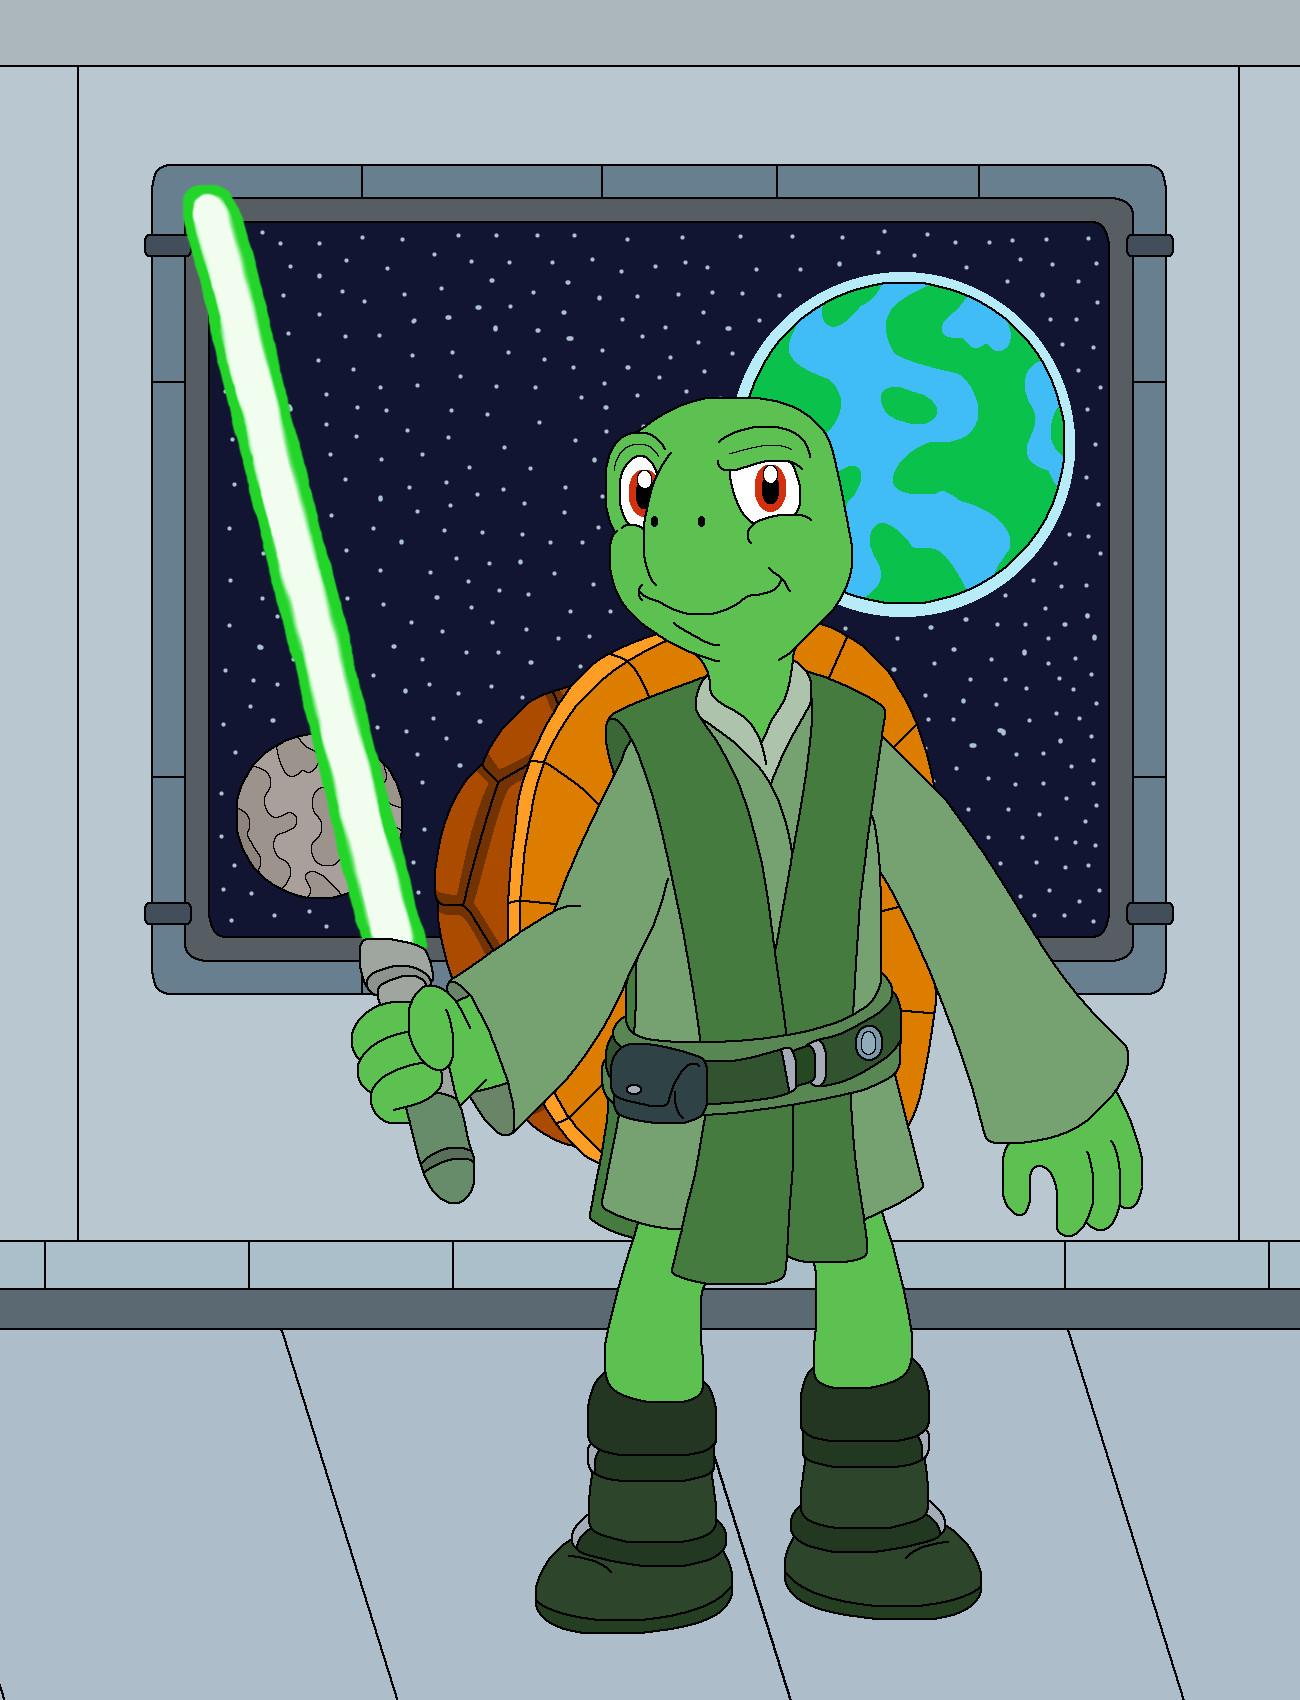 https://orig00.deviantart.net/f768/f/2013/073/d/2/franklin_the_green_jedi_turtle_by_mcsaurus-d5xzfqx.jpg